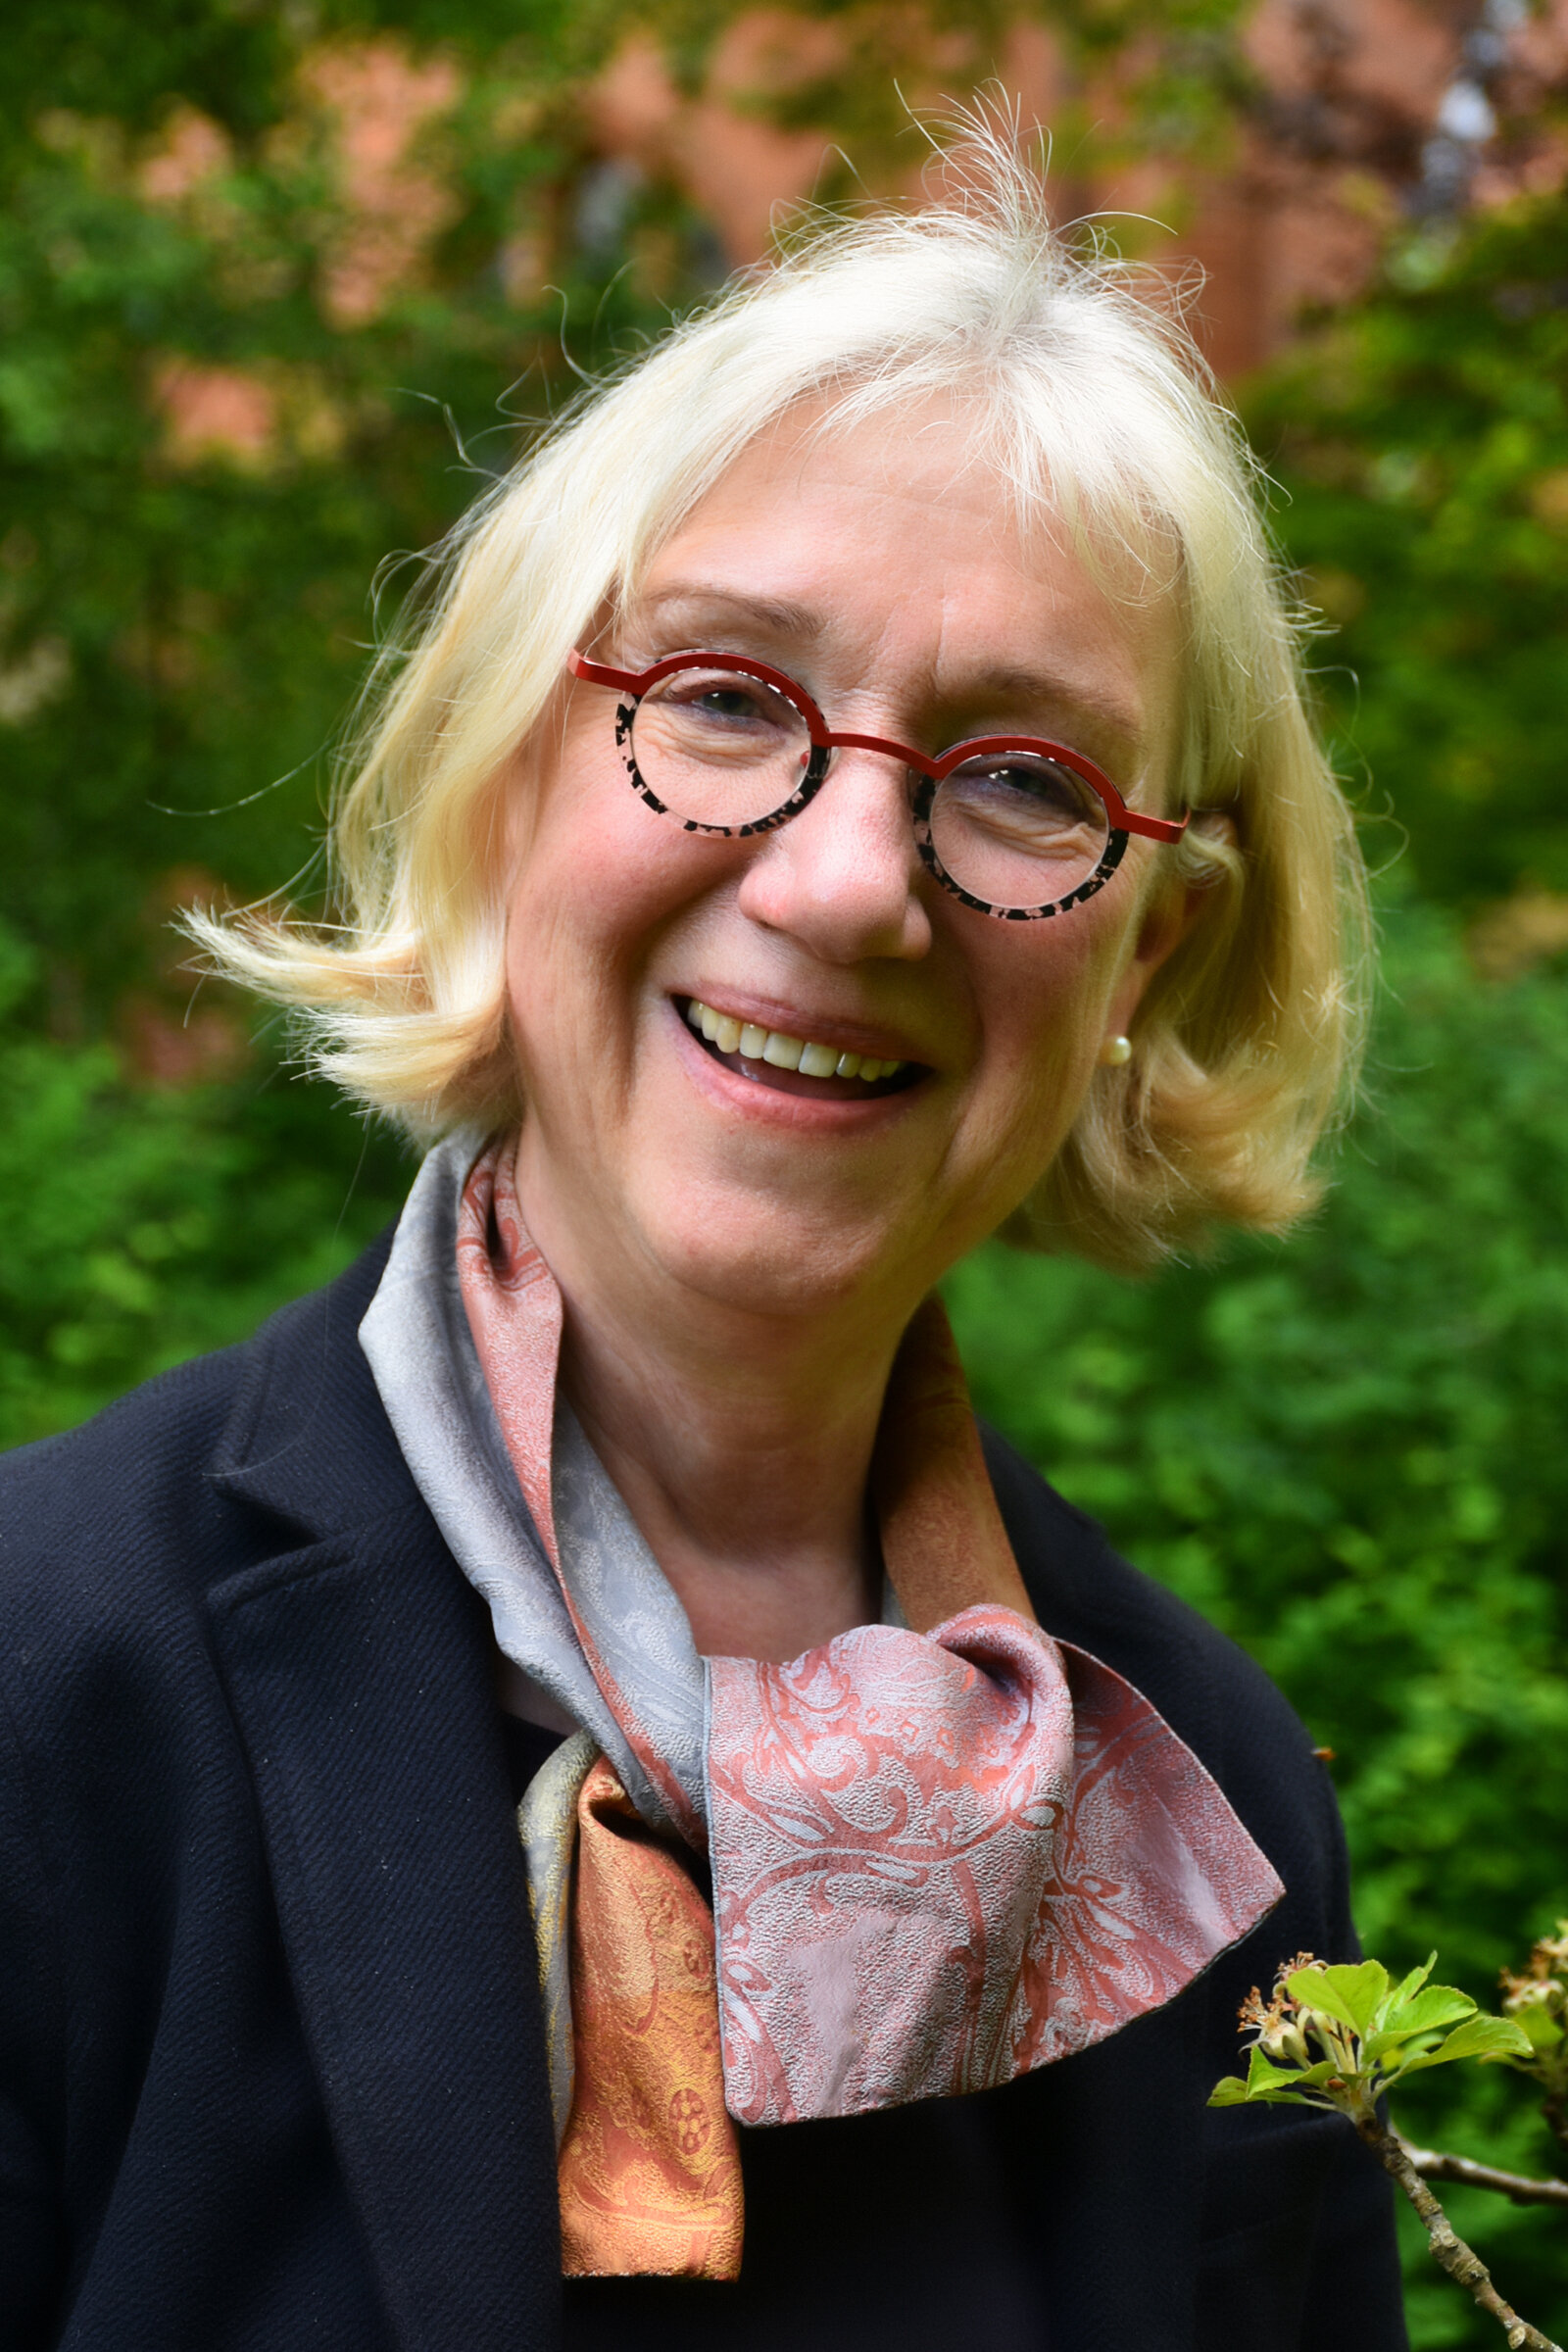 Pastorin Christina Norzel-Weiß